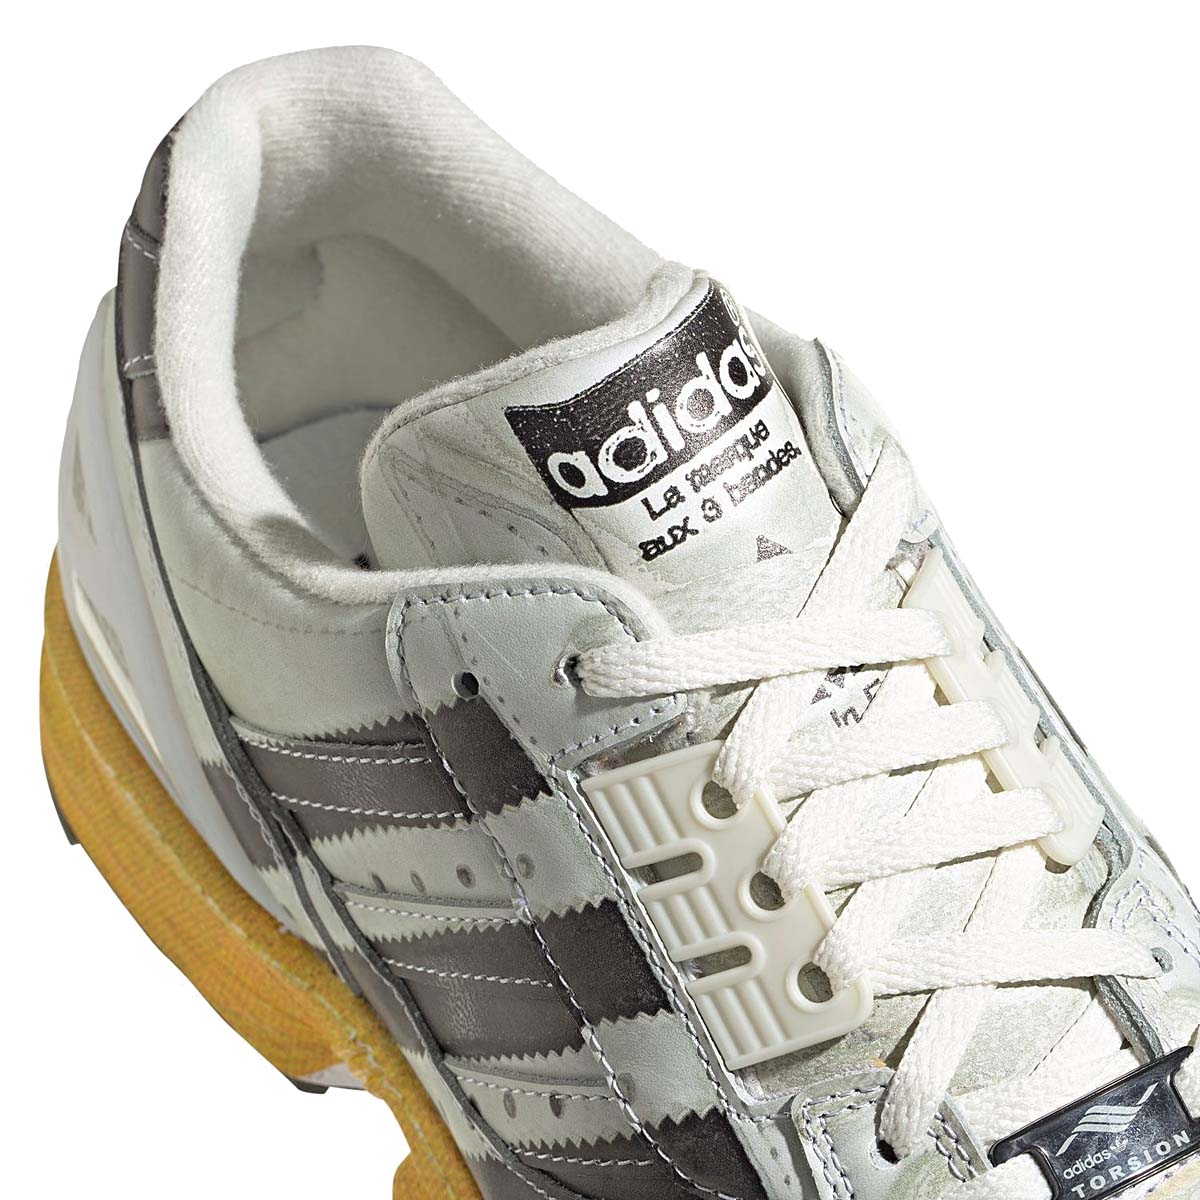 adidas Originals ZX8000 SUPERSTAR FOOTWEAR WHITE / CORE BLACK / OFF WHITE FW6092 アディダス オリジナルス ZX8000 スーパースター ホワイト/ブラック/オフホワイト